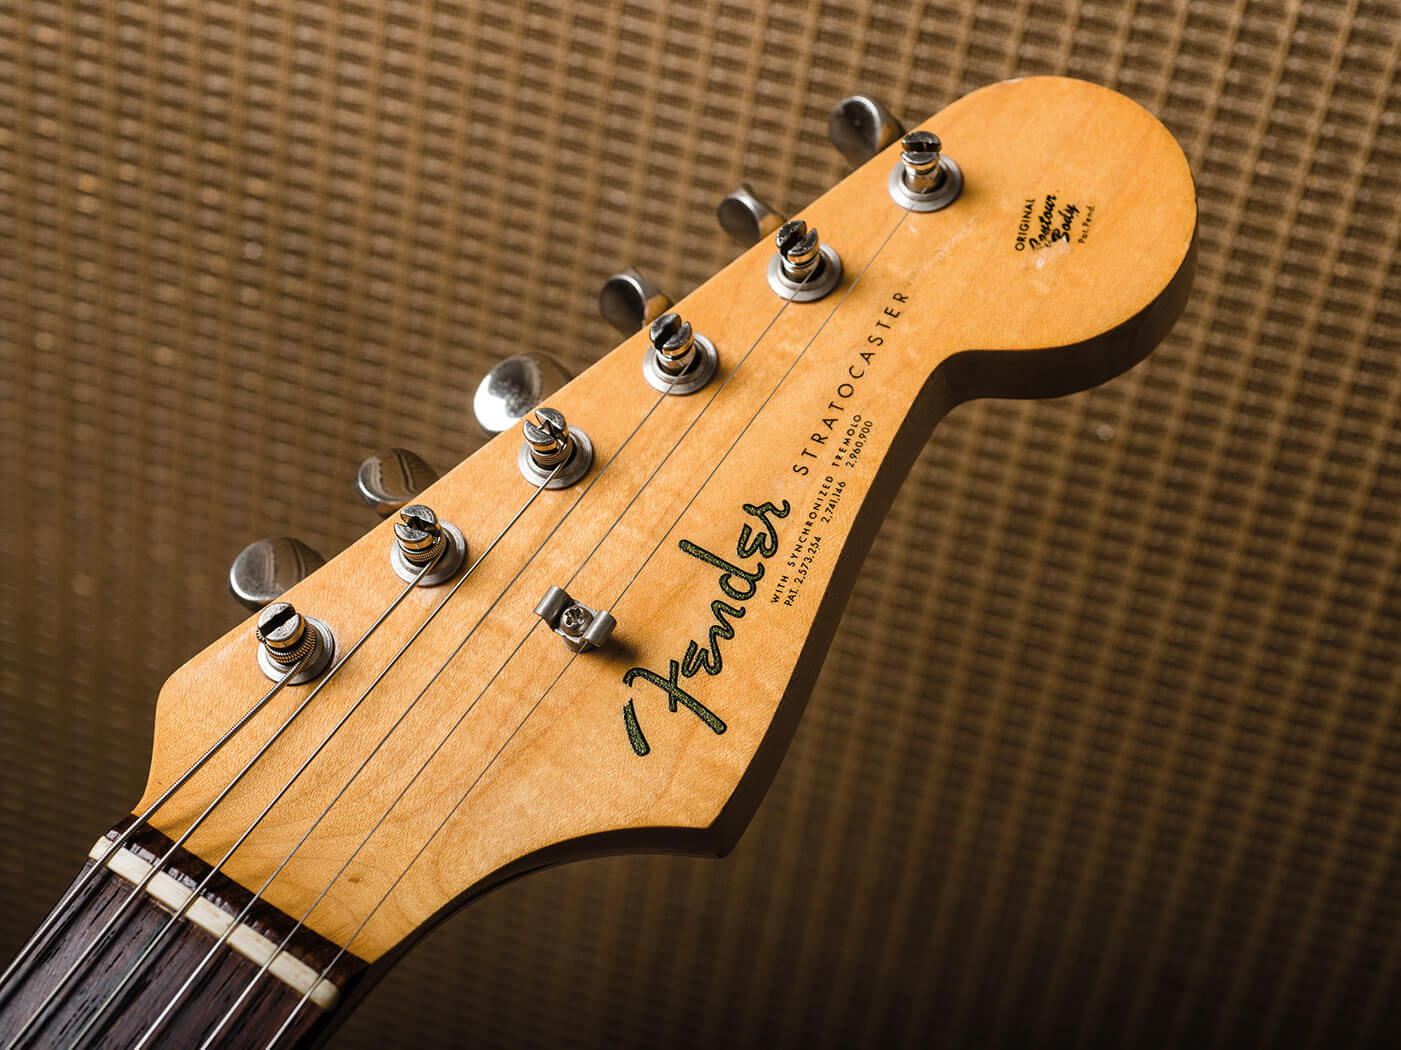 Fender Pre-CBS Surf Green Strat headstock worn decal